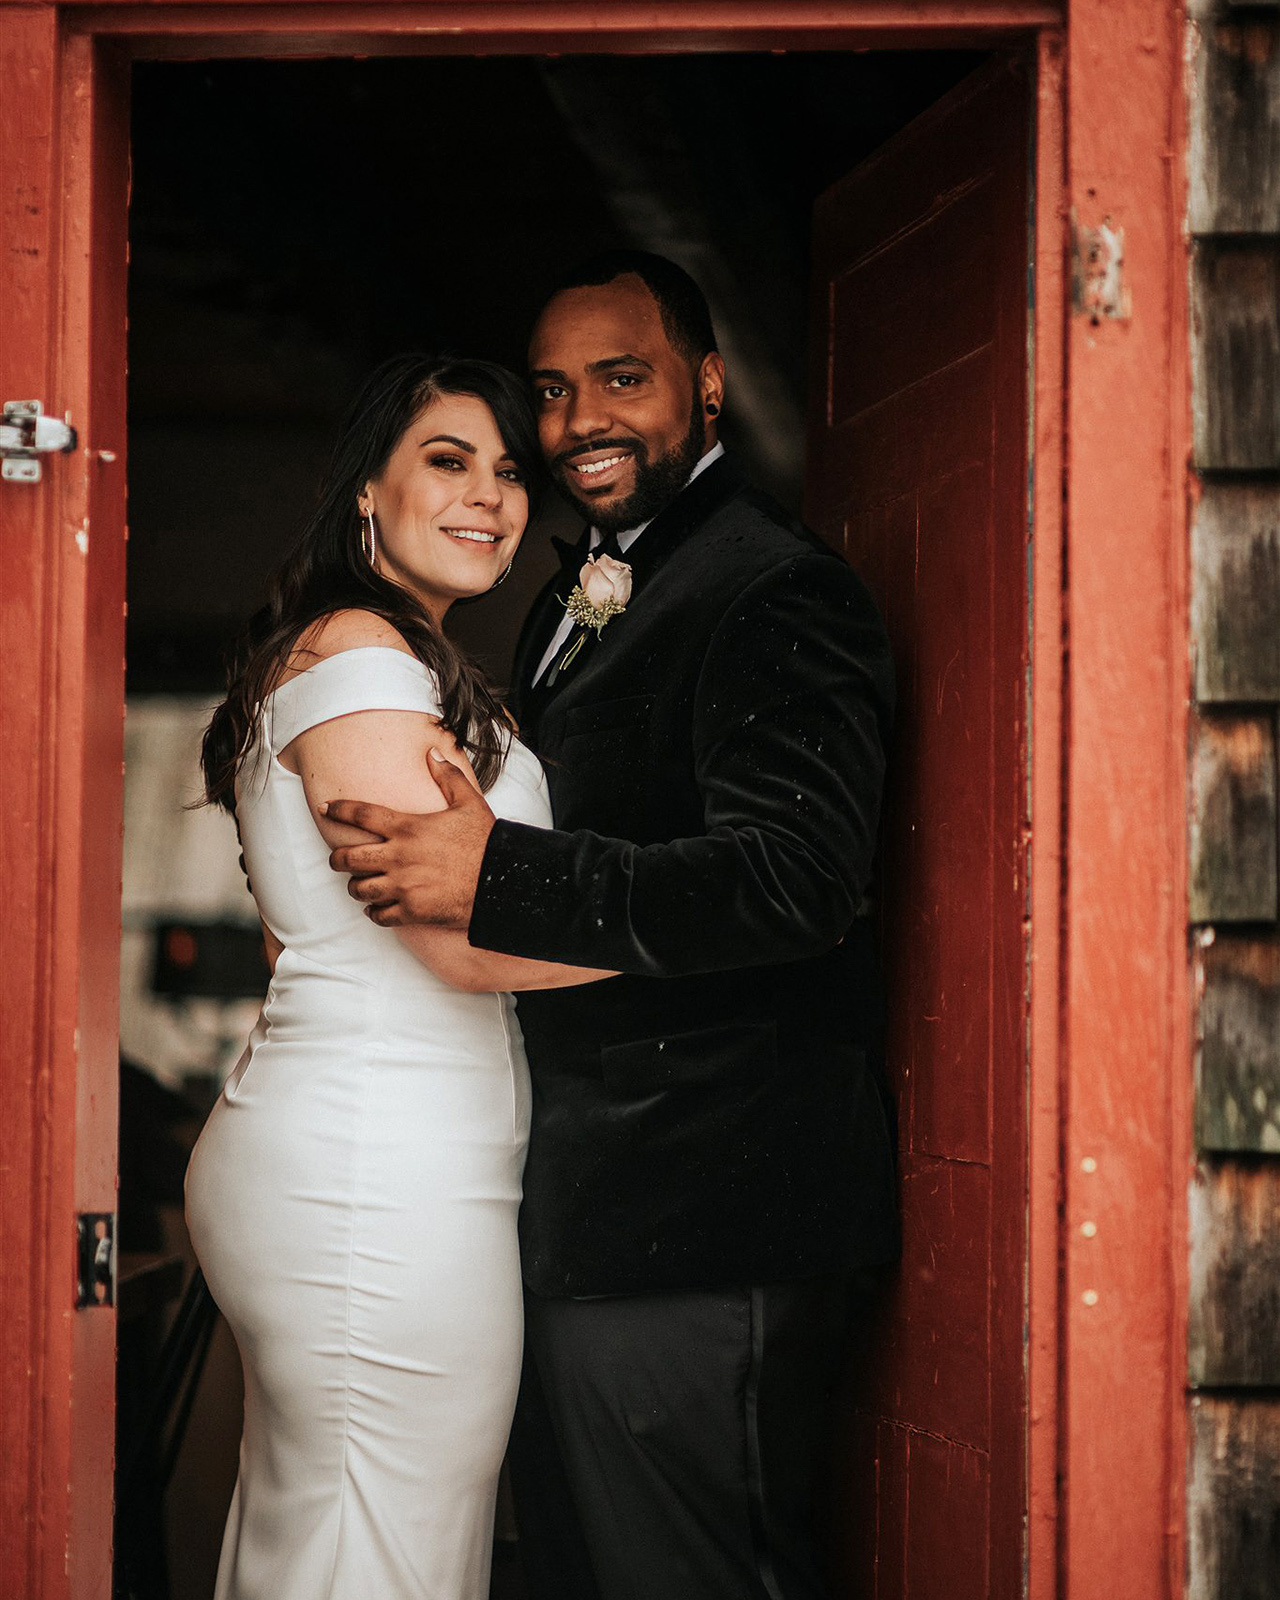 stephanie taurean wedding couple in doorway